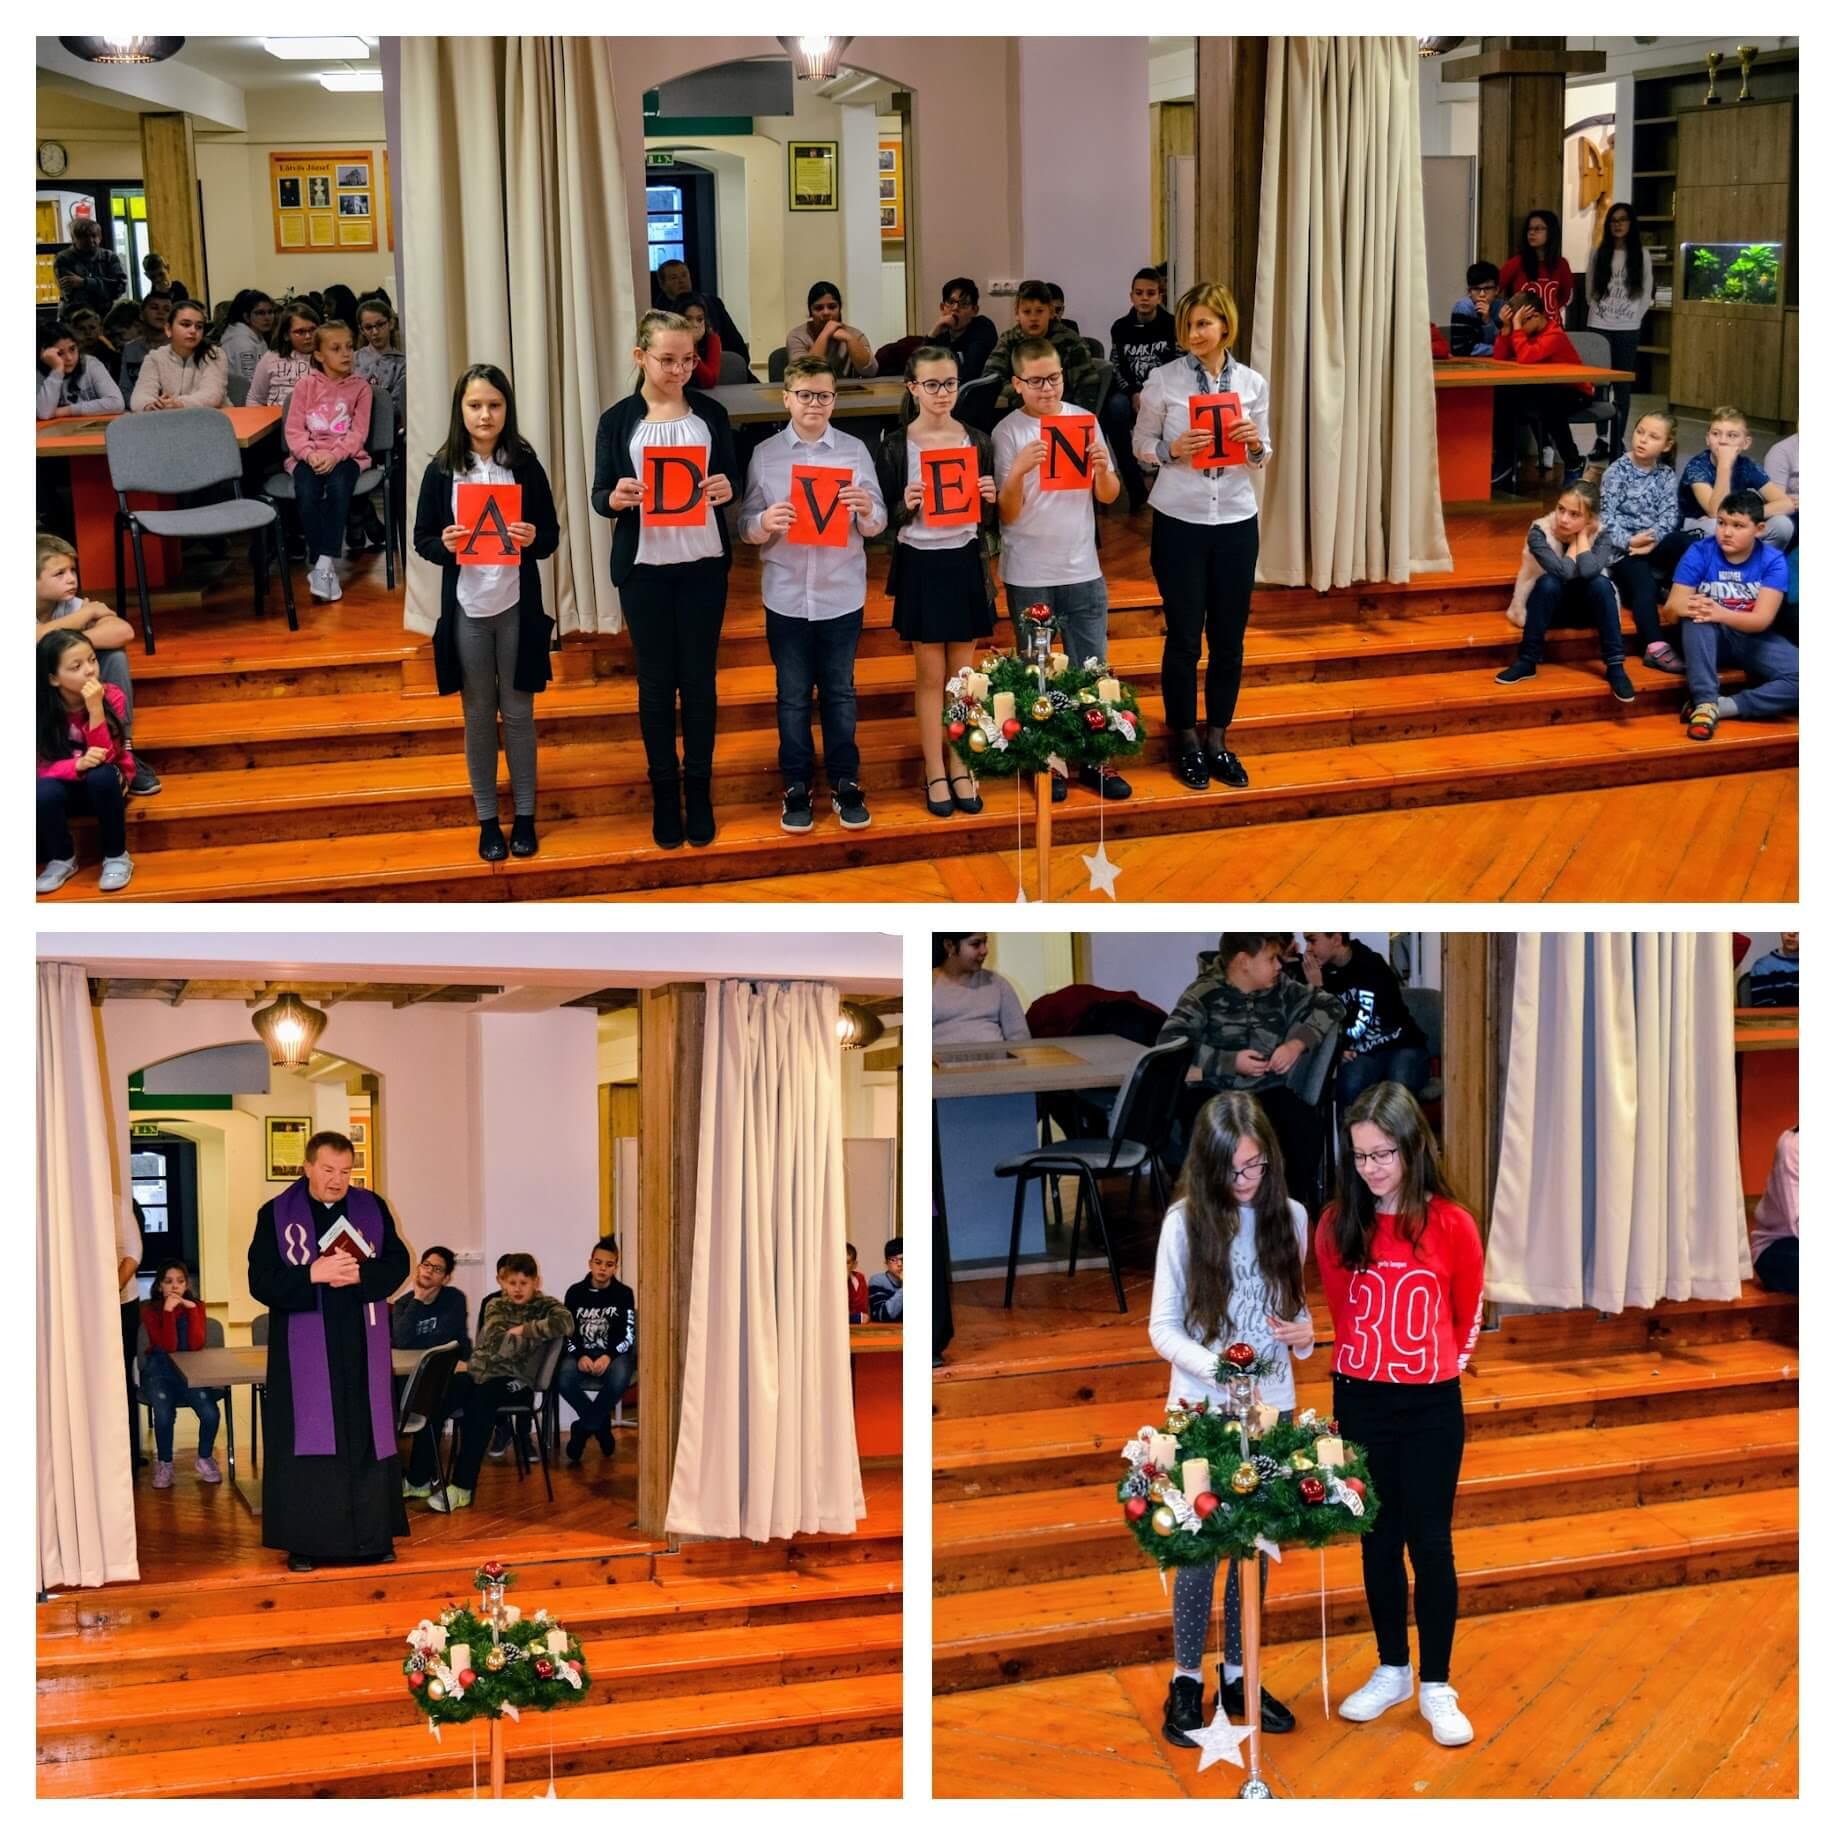 I.adventi Gyertyagyujtas Eotvosoh 2019 12 02 0011 Collage